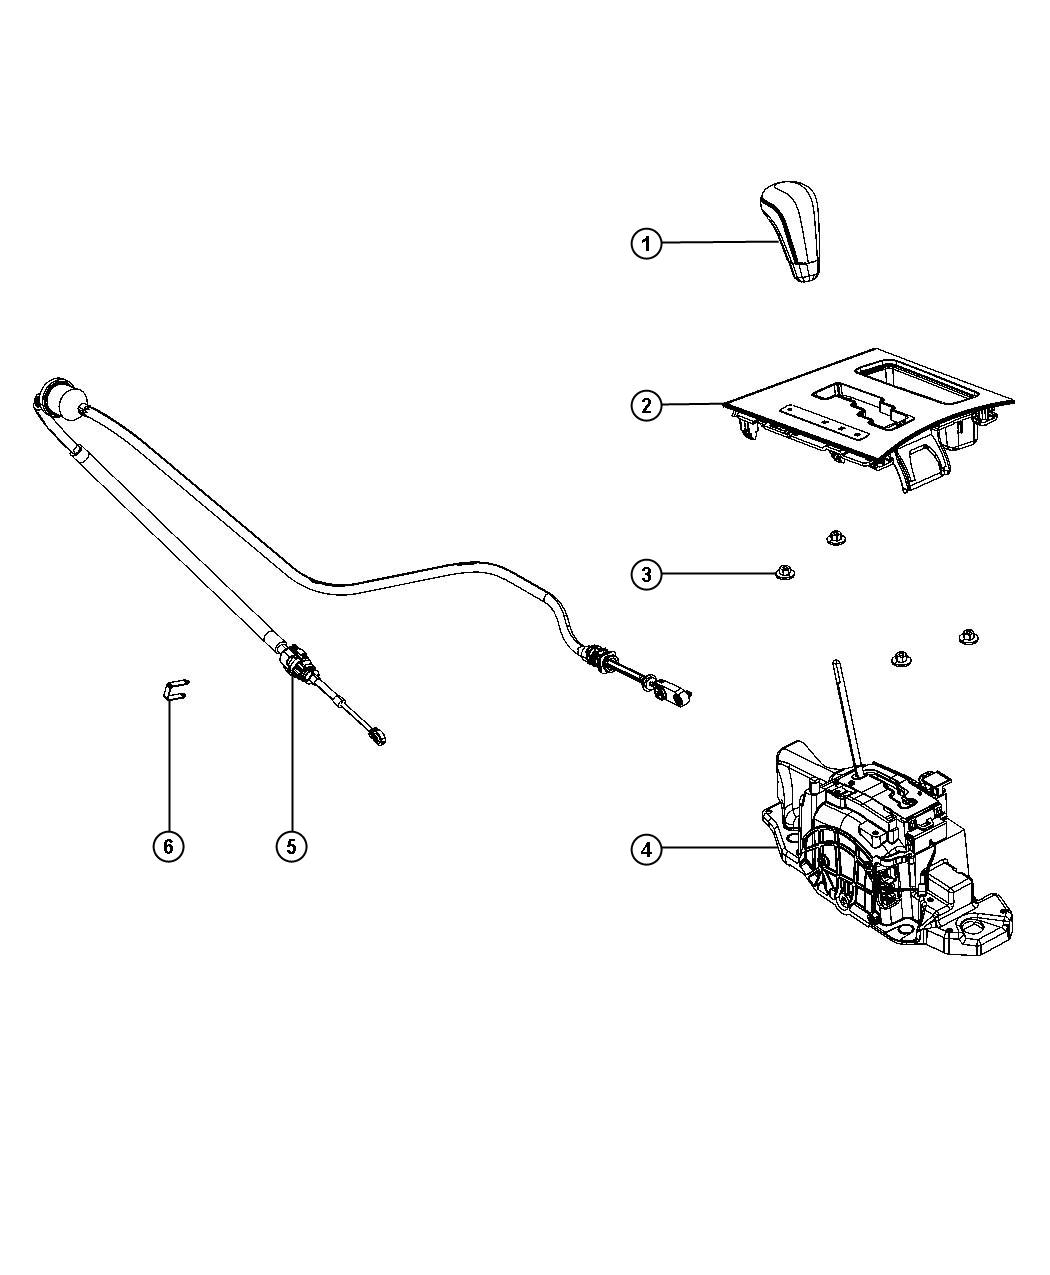 2012 Dodge Charger Bezel. Gear shift indicator. Trim: [all